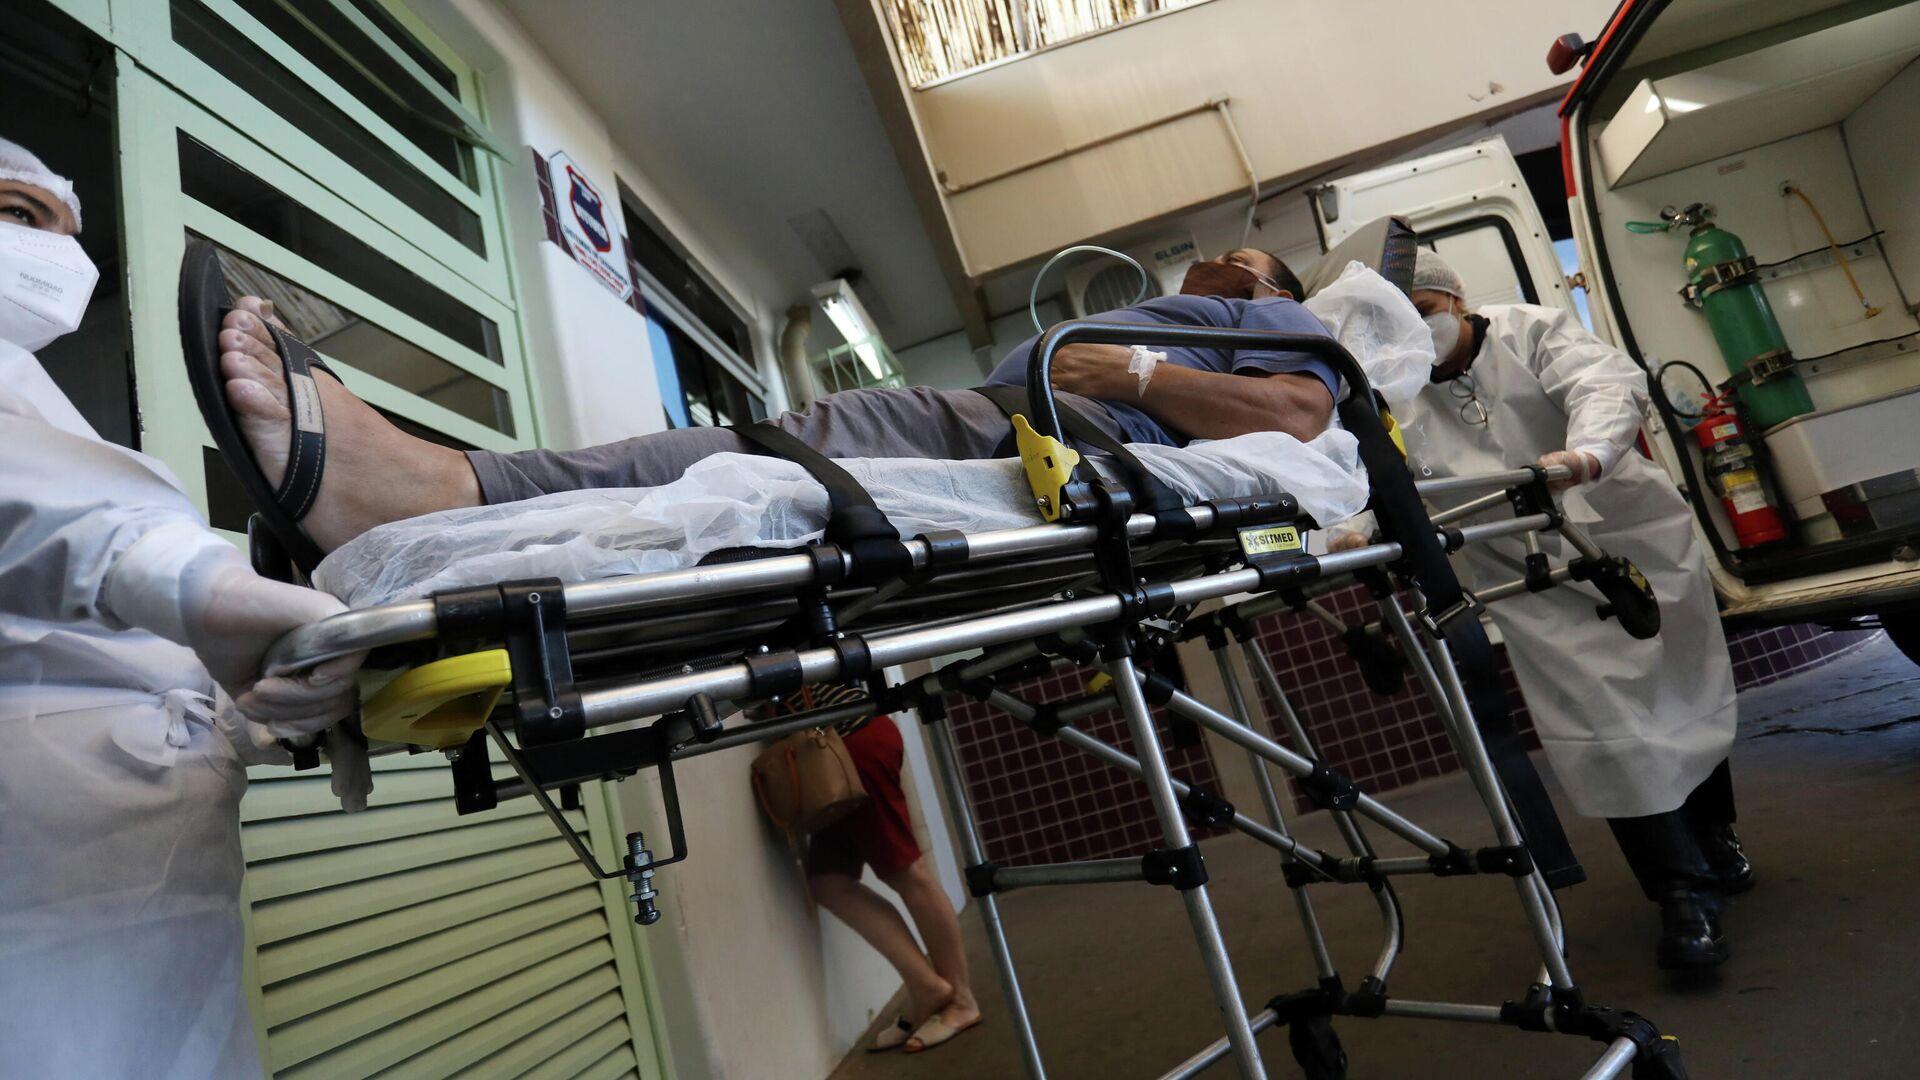 Paciente con COVID-19 en hospital en Brasil - Sputnik Mundo, 1920, 08.04.2021